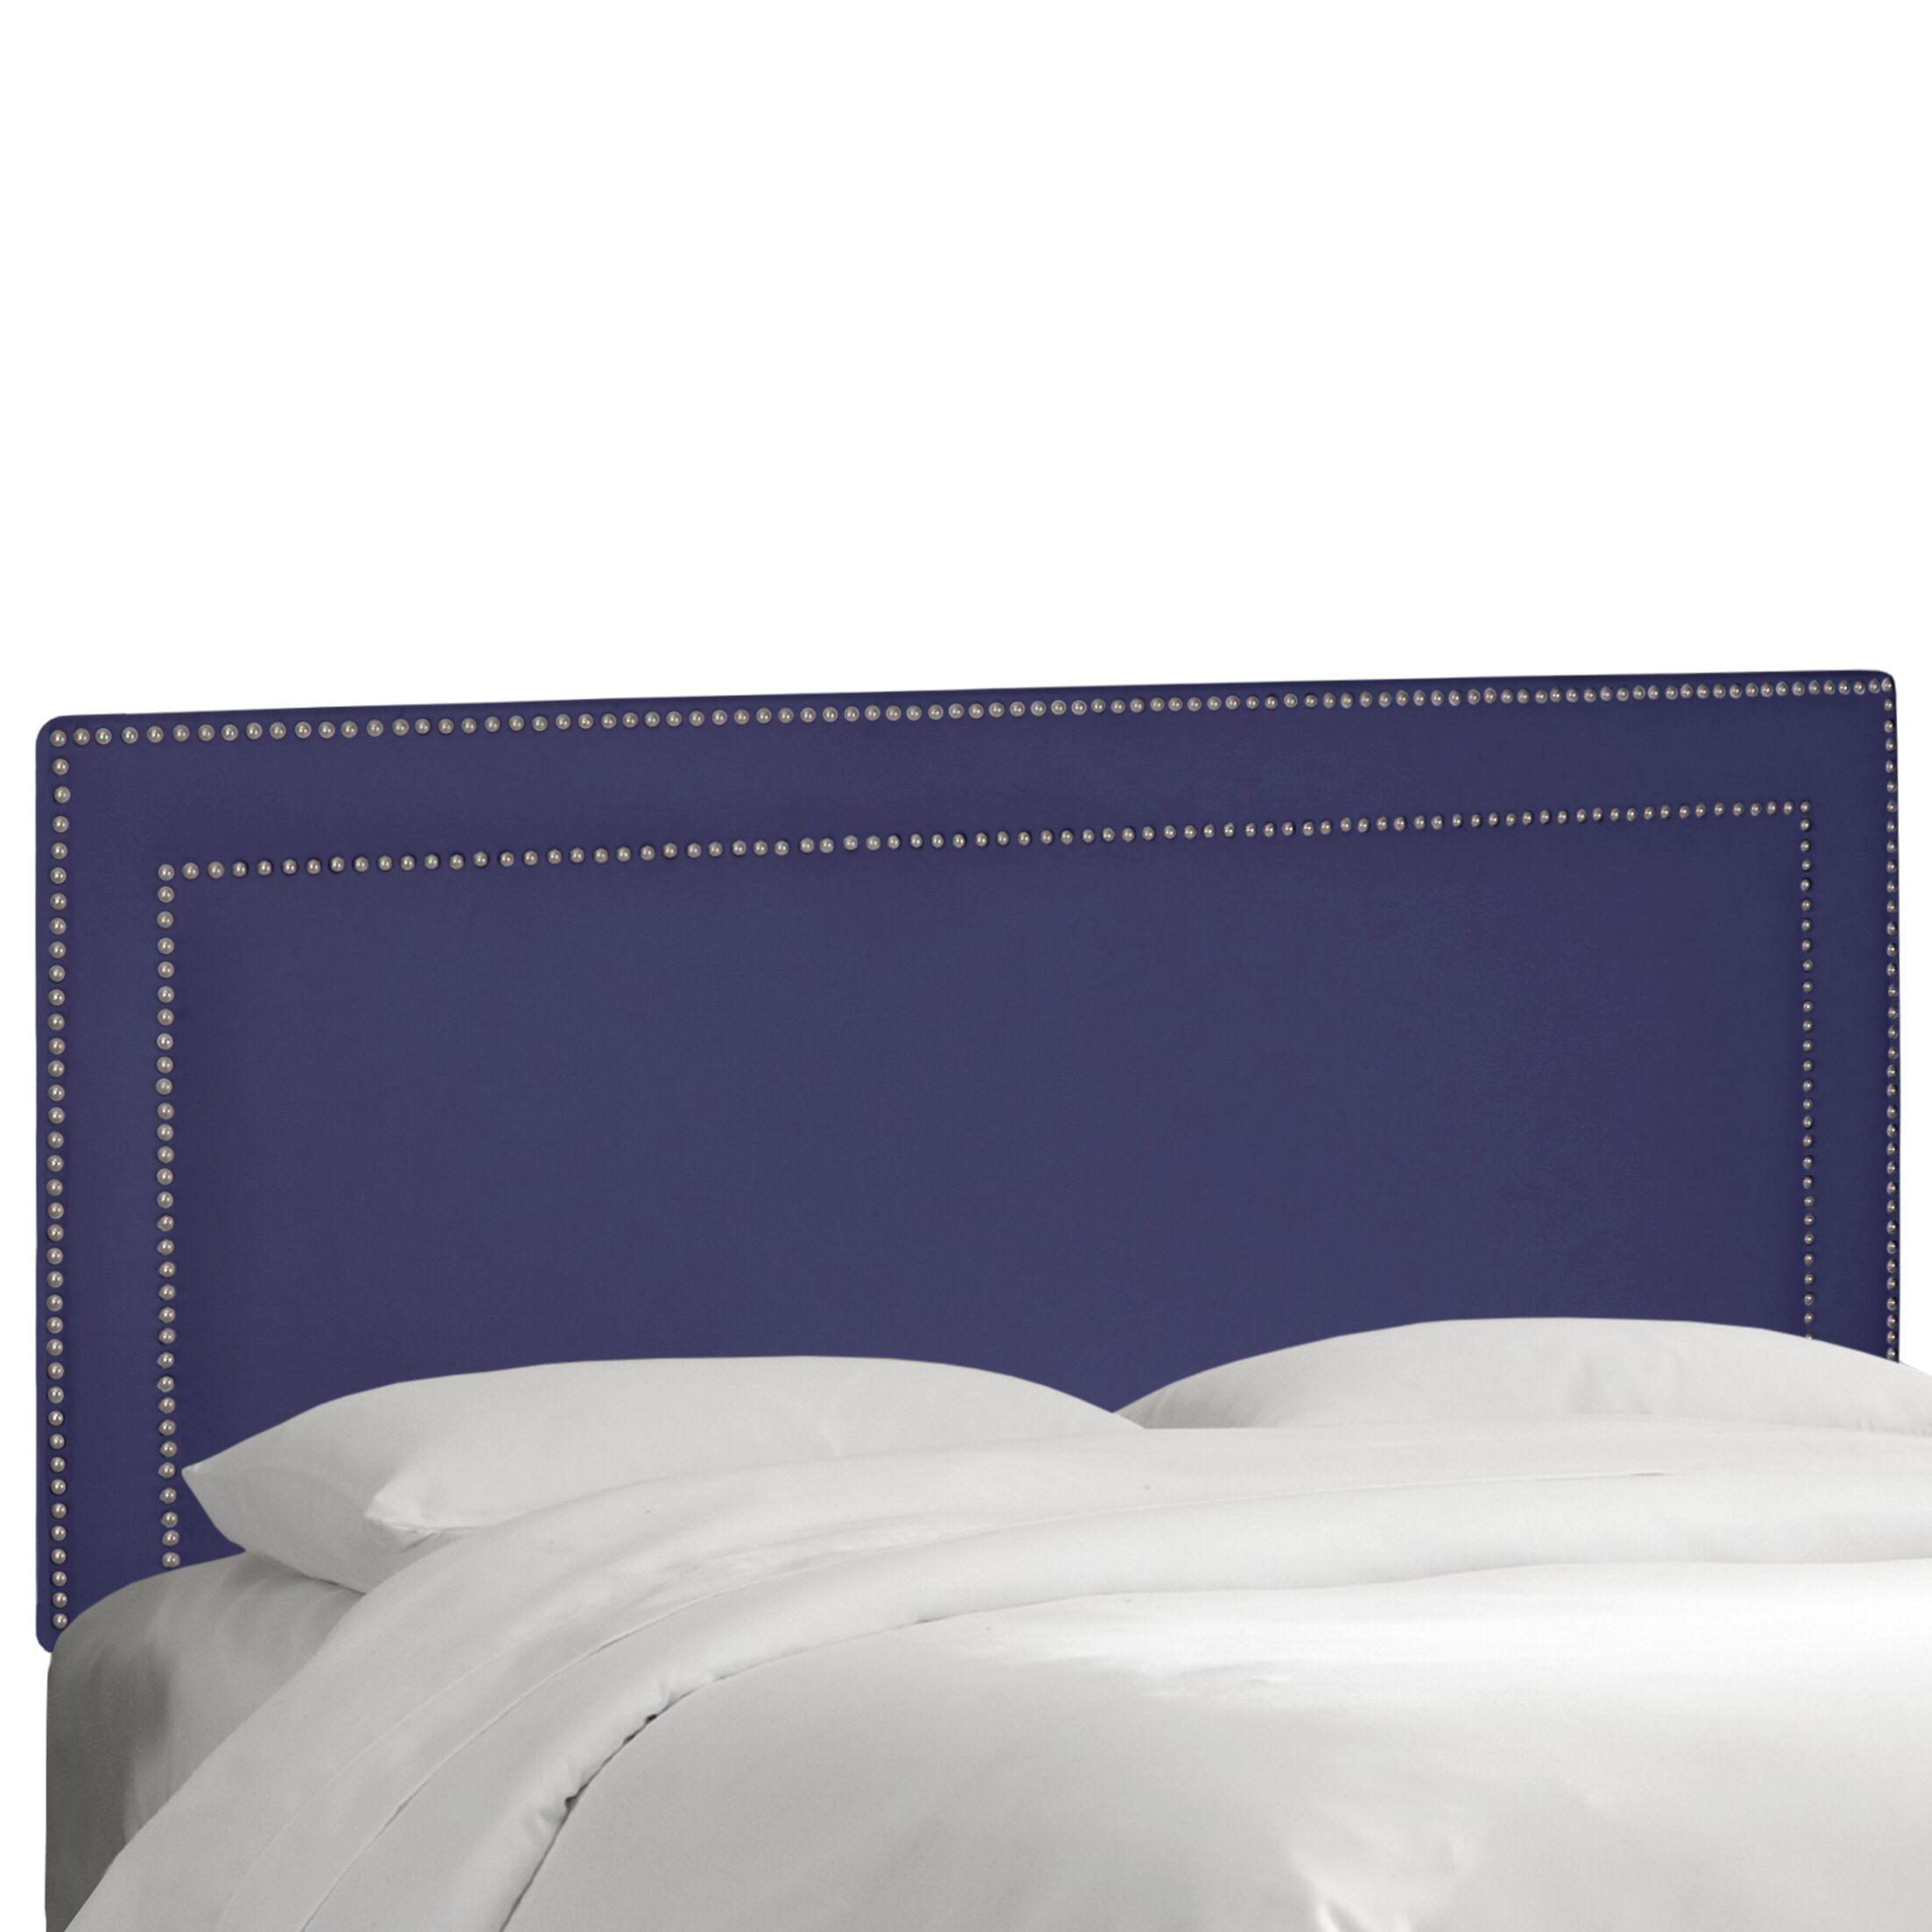 Fanning Springs Upholstered Panel Headboard Upholstery: Regal Patriot Blue, Size: King